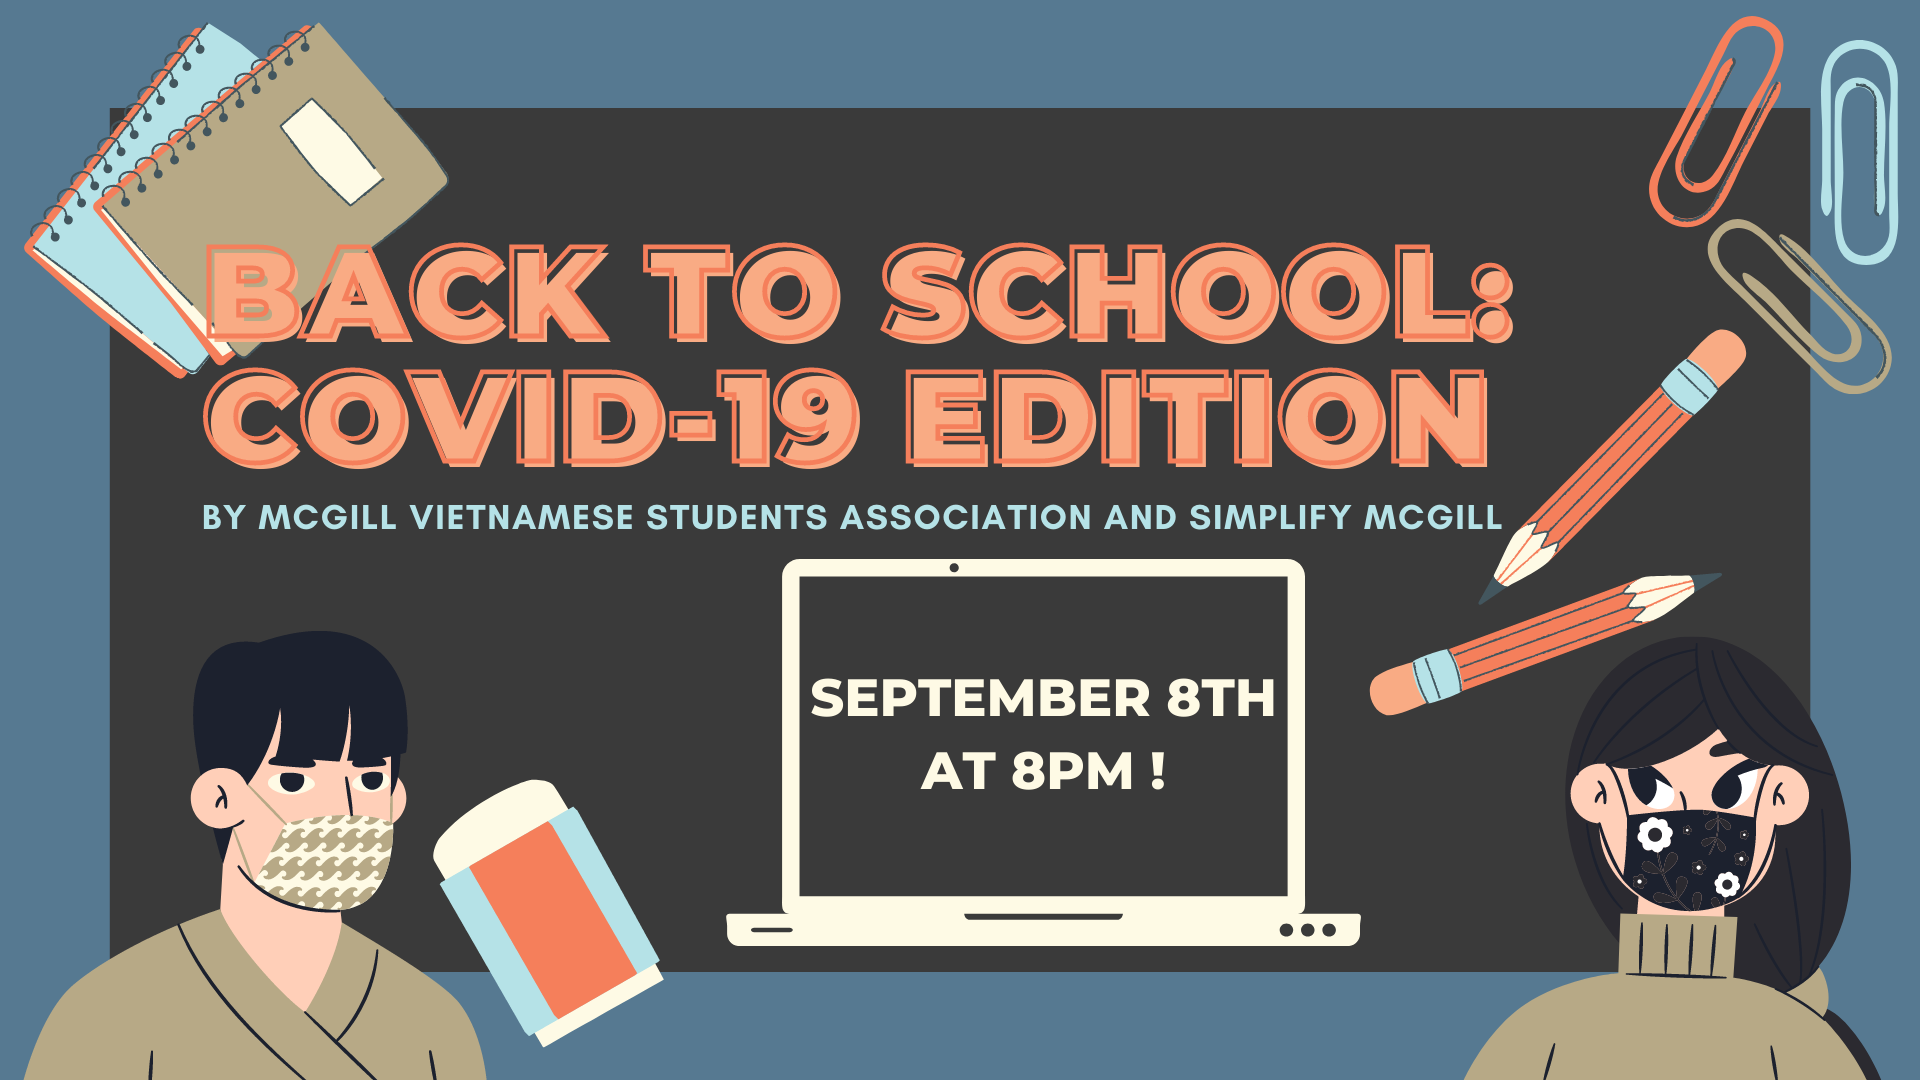 Back To School: COVID-19 Edition